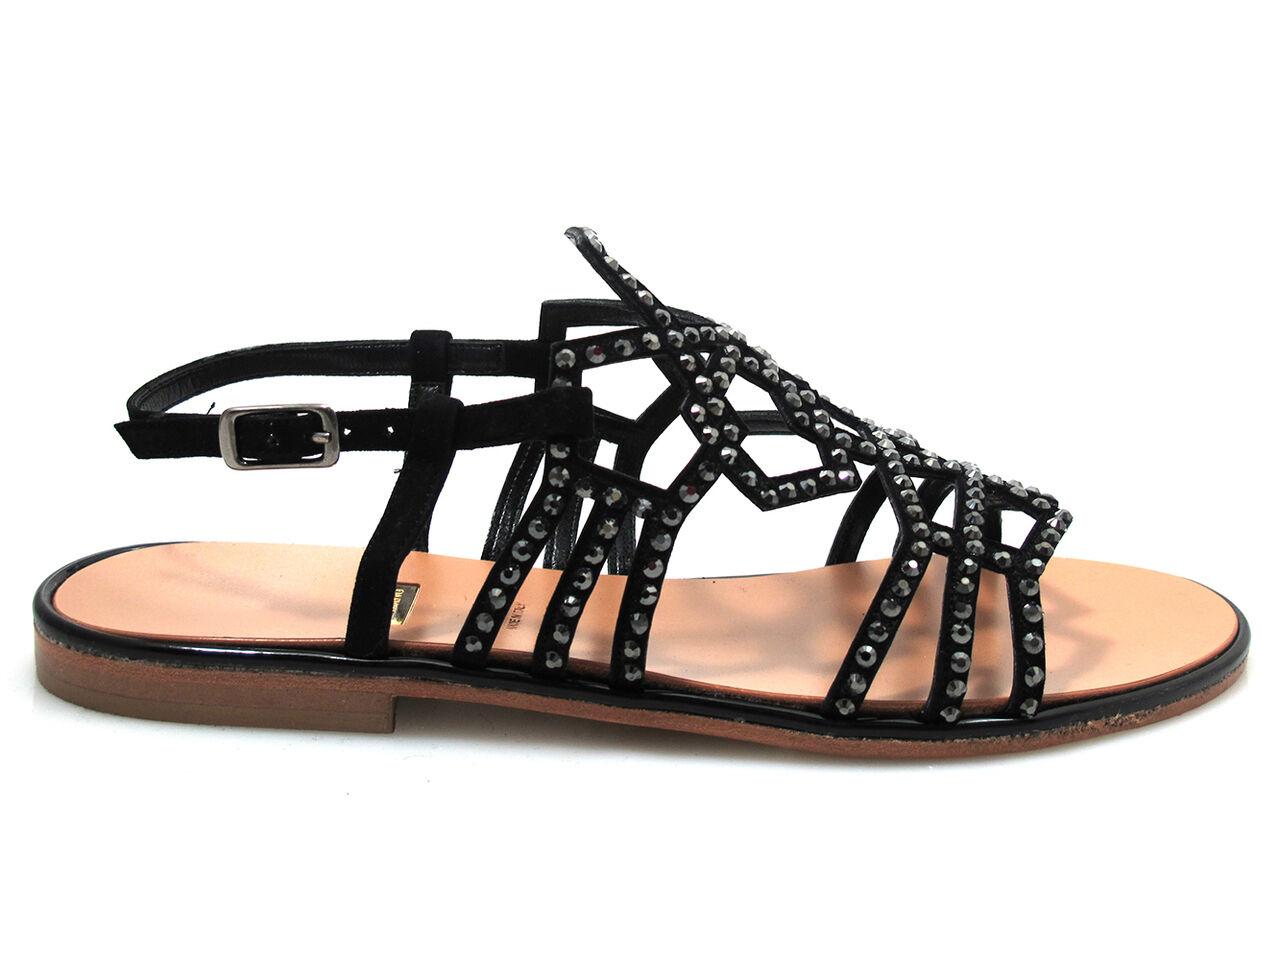 Albano Albano Albano 4894 mujer sandalia plana de vestir Elegante Correas de cristales de Swarovski negro  preferente